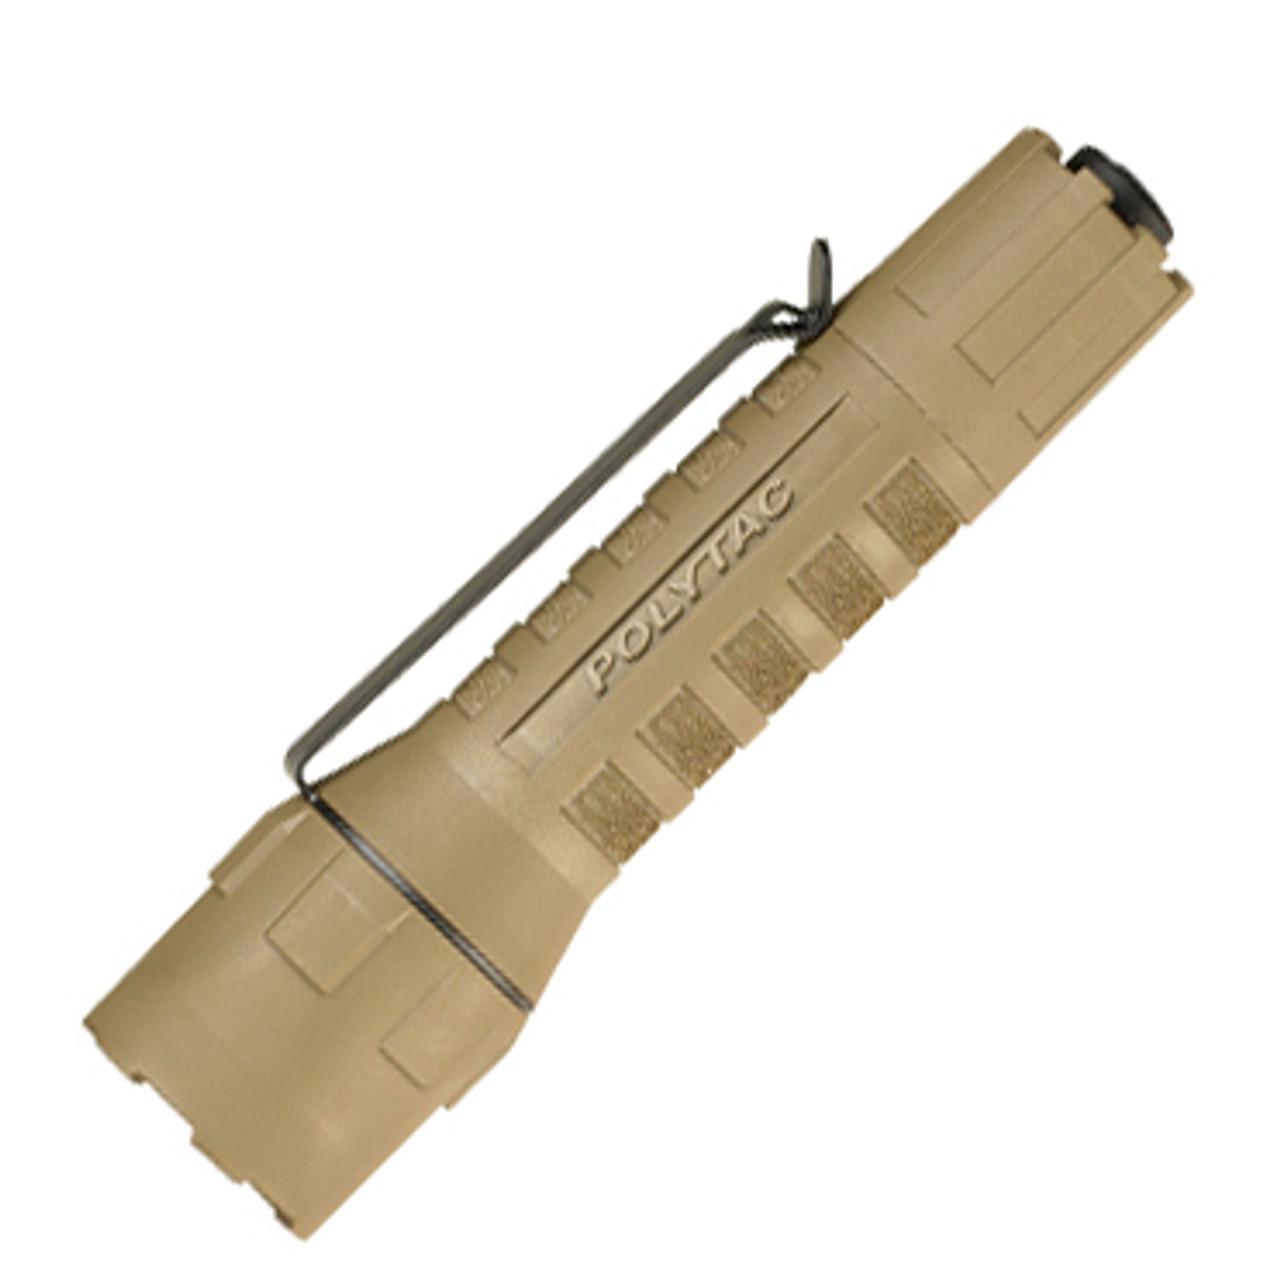 Streamlight PolyTac Tactical Flashlight 88851, C4 LED Light, 600 Max Lumens, Coyote